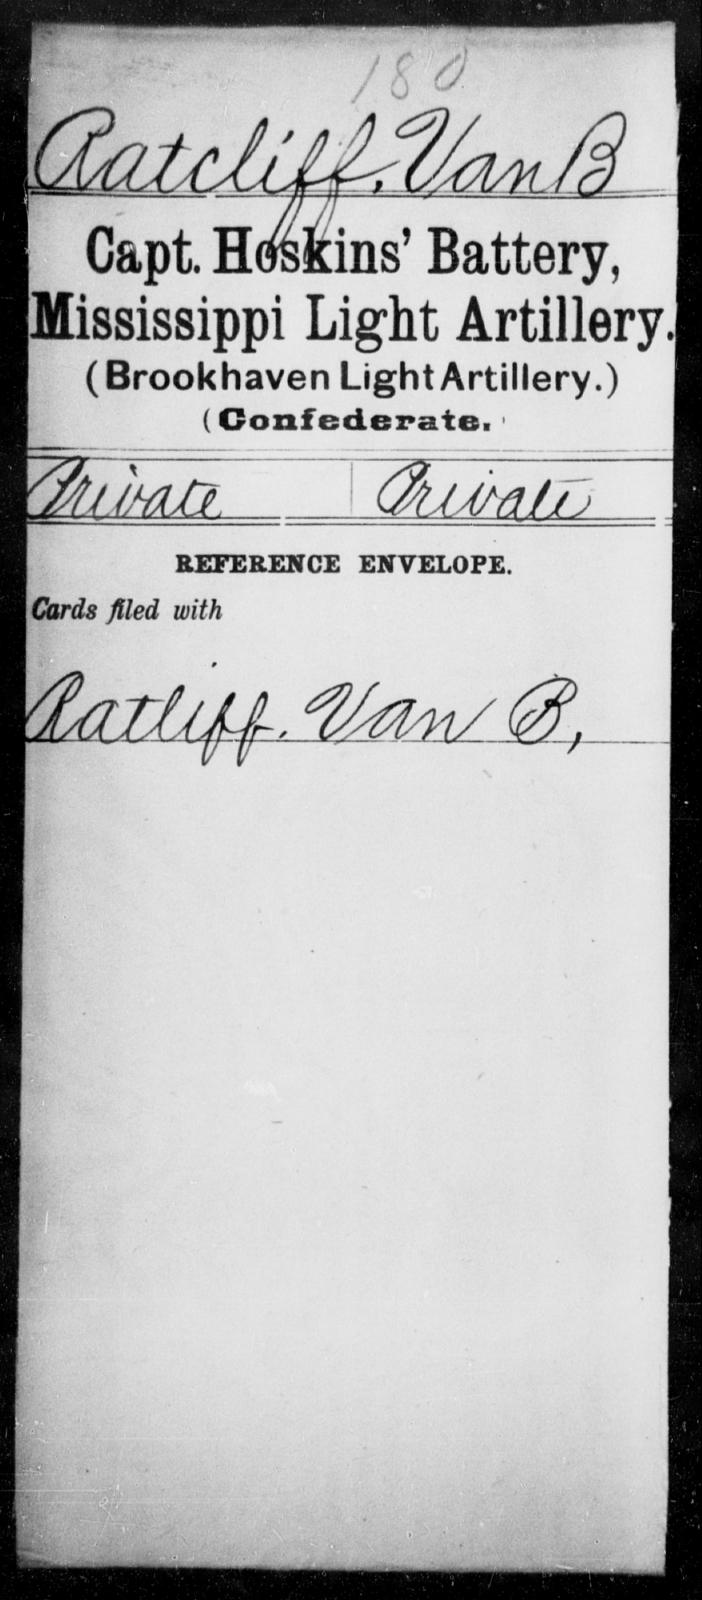 Ratcliff, Van B - Age: [Blank], Year: [BLANK] - Mississippi Capt. Hoole's Co., Light Artillery (Hudson Battery), H-Y AND Capt. Hoskins' Battery, Light Artillery (Brookhaven Light Artillery) AND Capt Kittrell's Co. (Wesson Artillery), Artillery